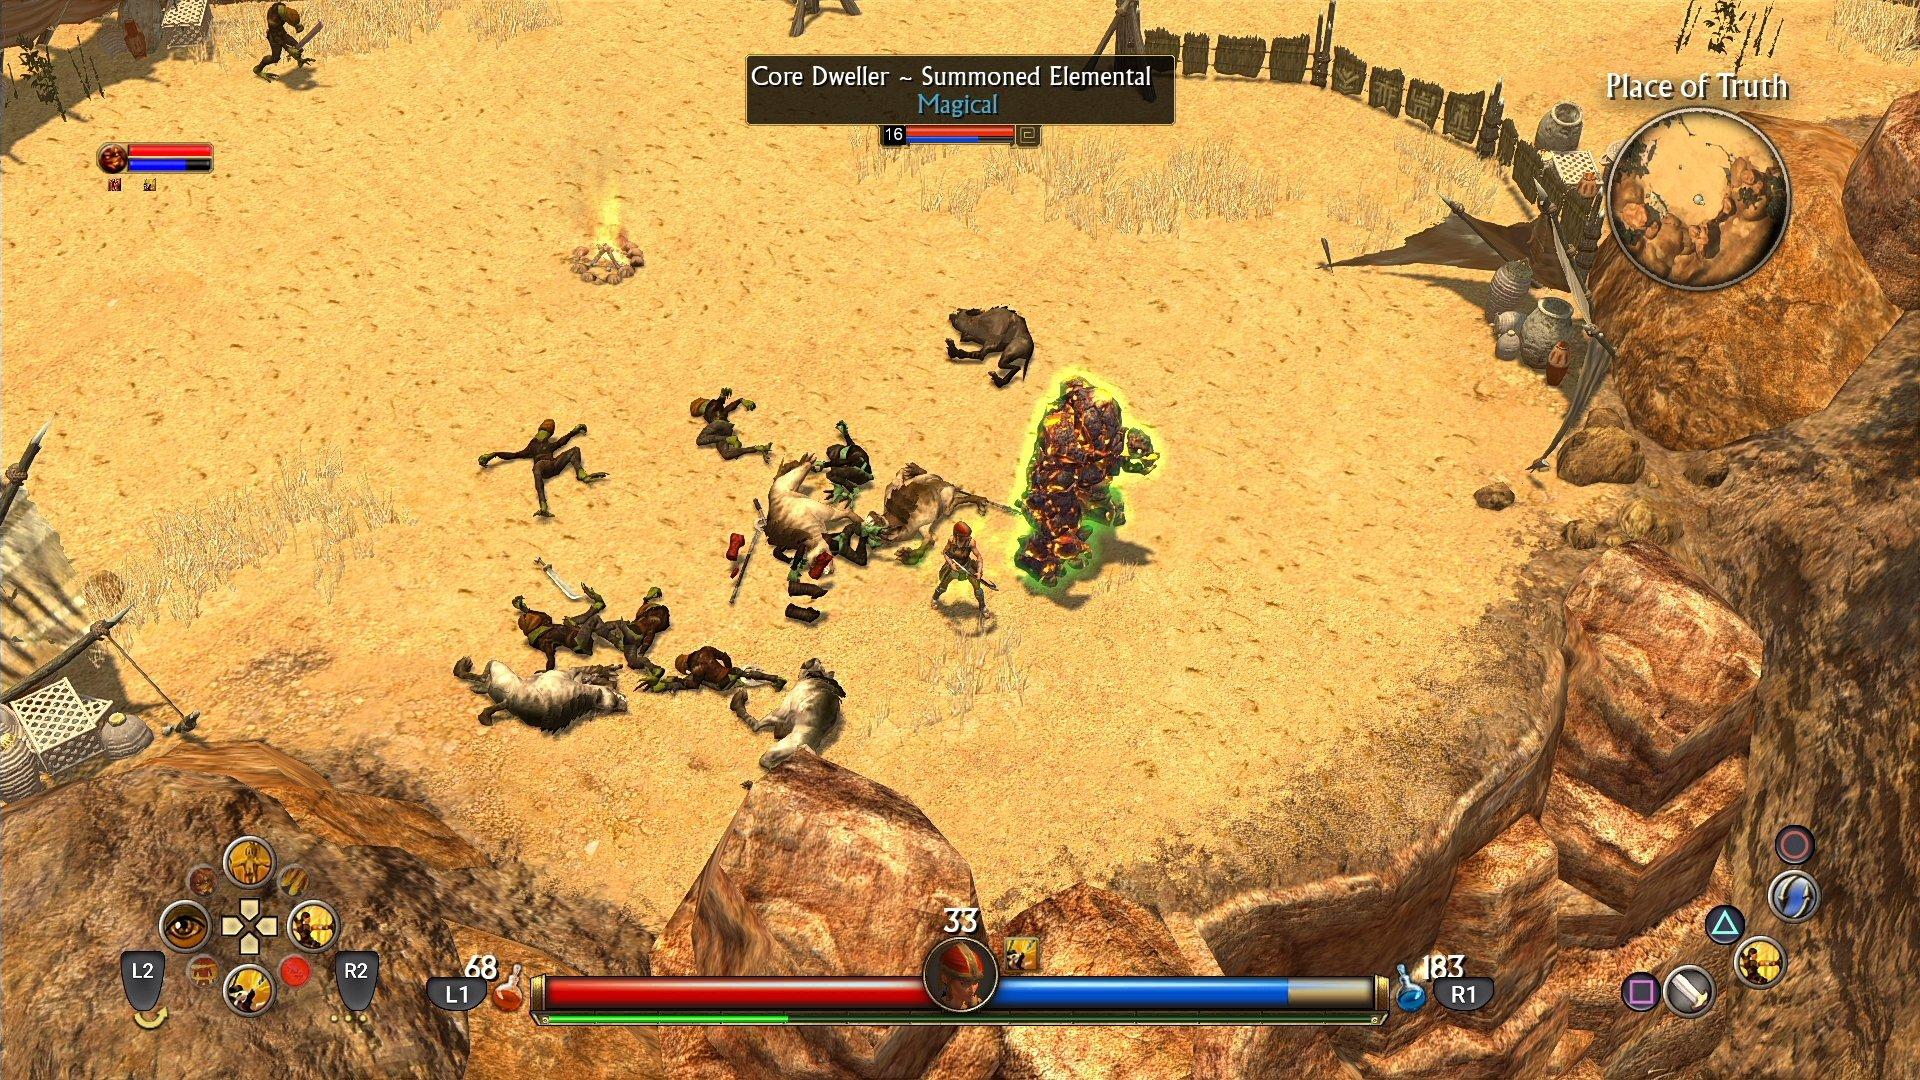 haruspex set titan quest cheats - FREE ONLINE